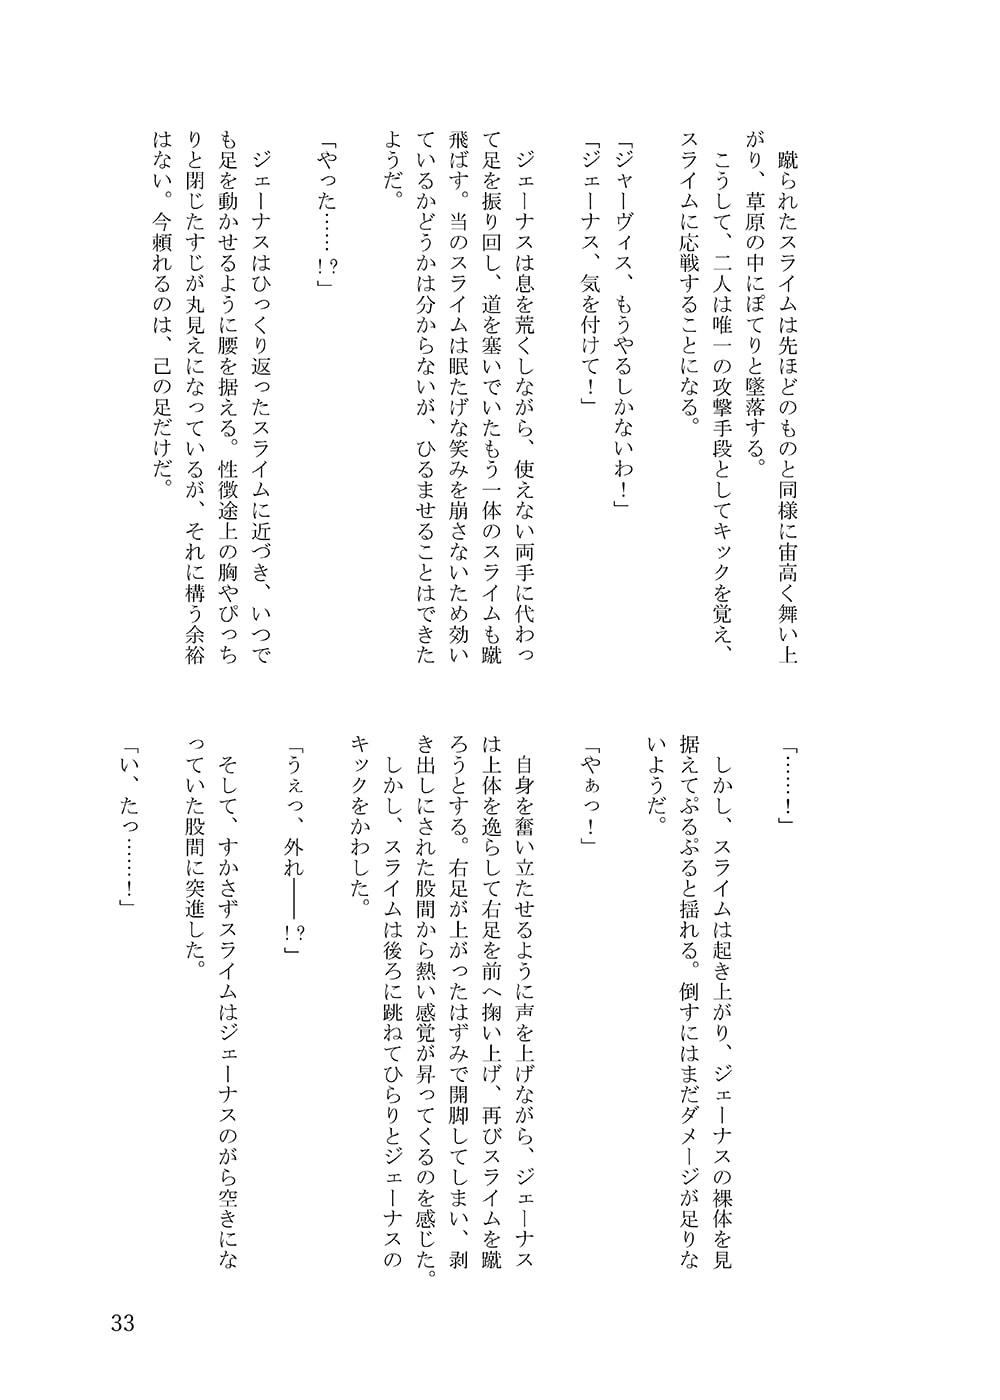 RJ286438 [20200814]J級艦娘が異世界に来たらチート級のデバフを受けて放り出された本